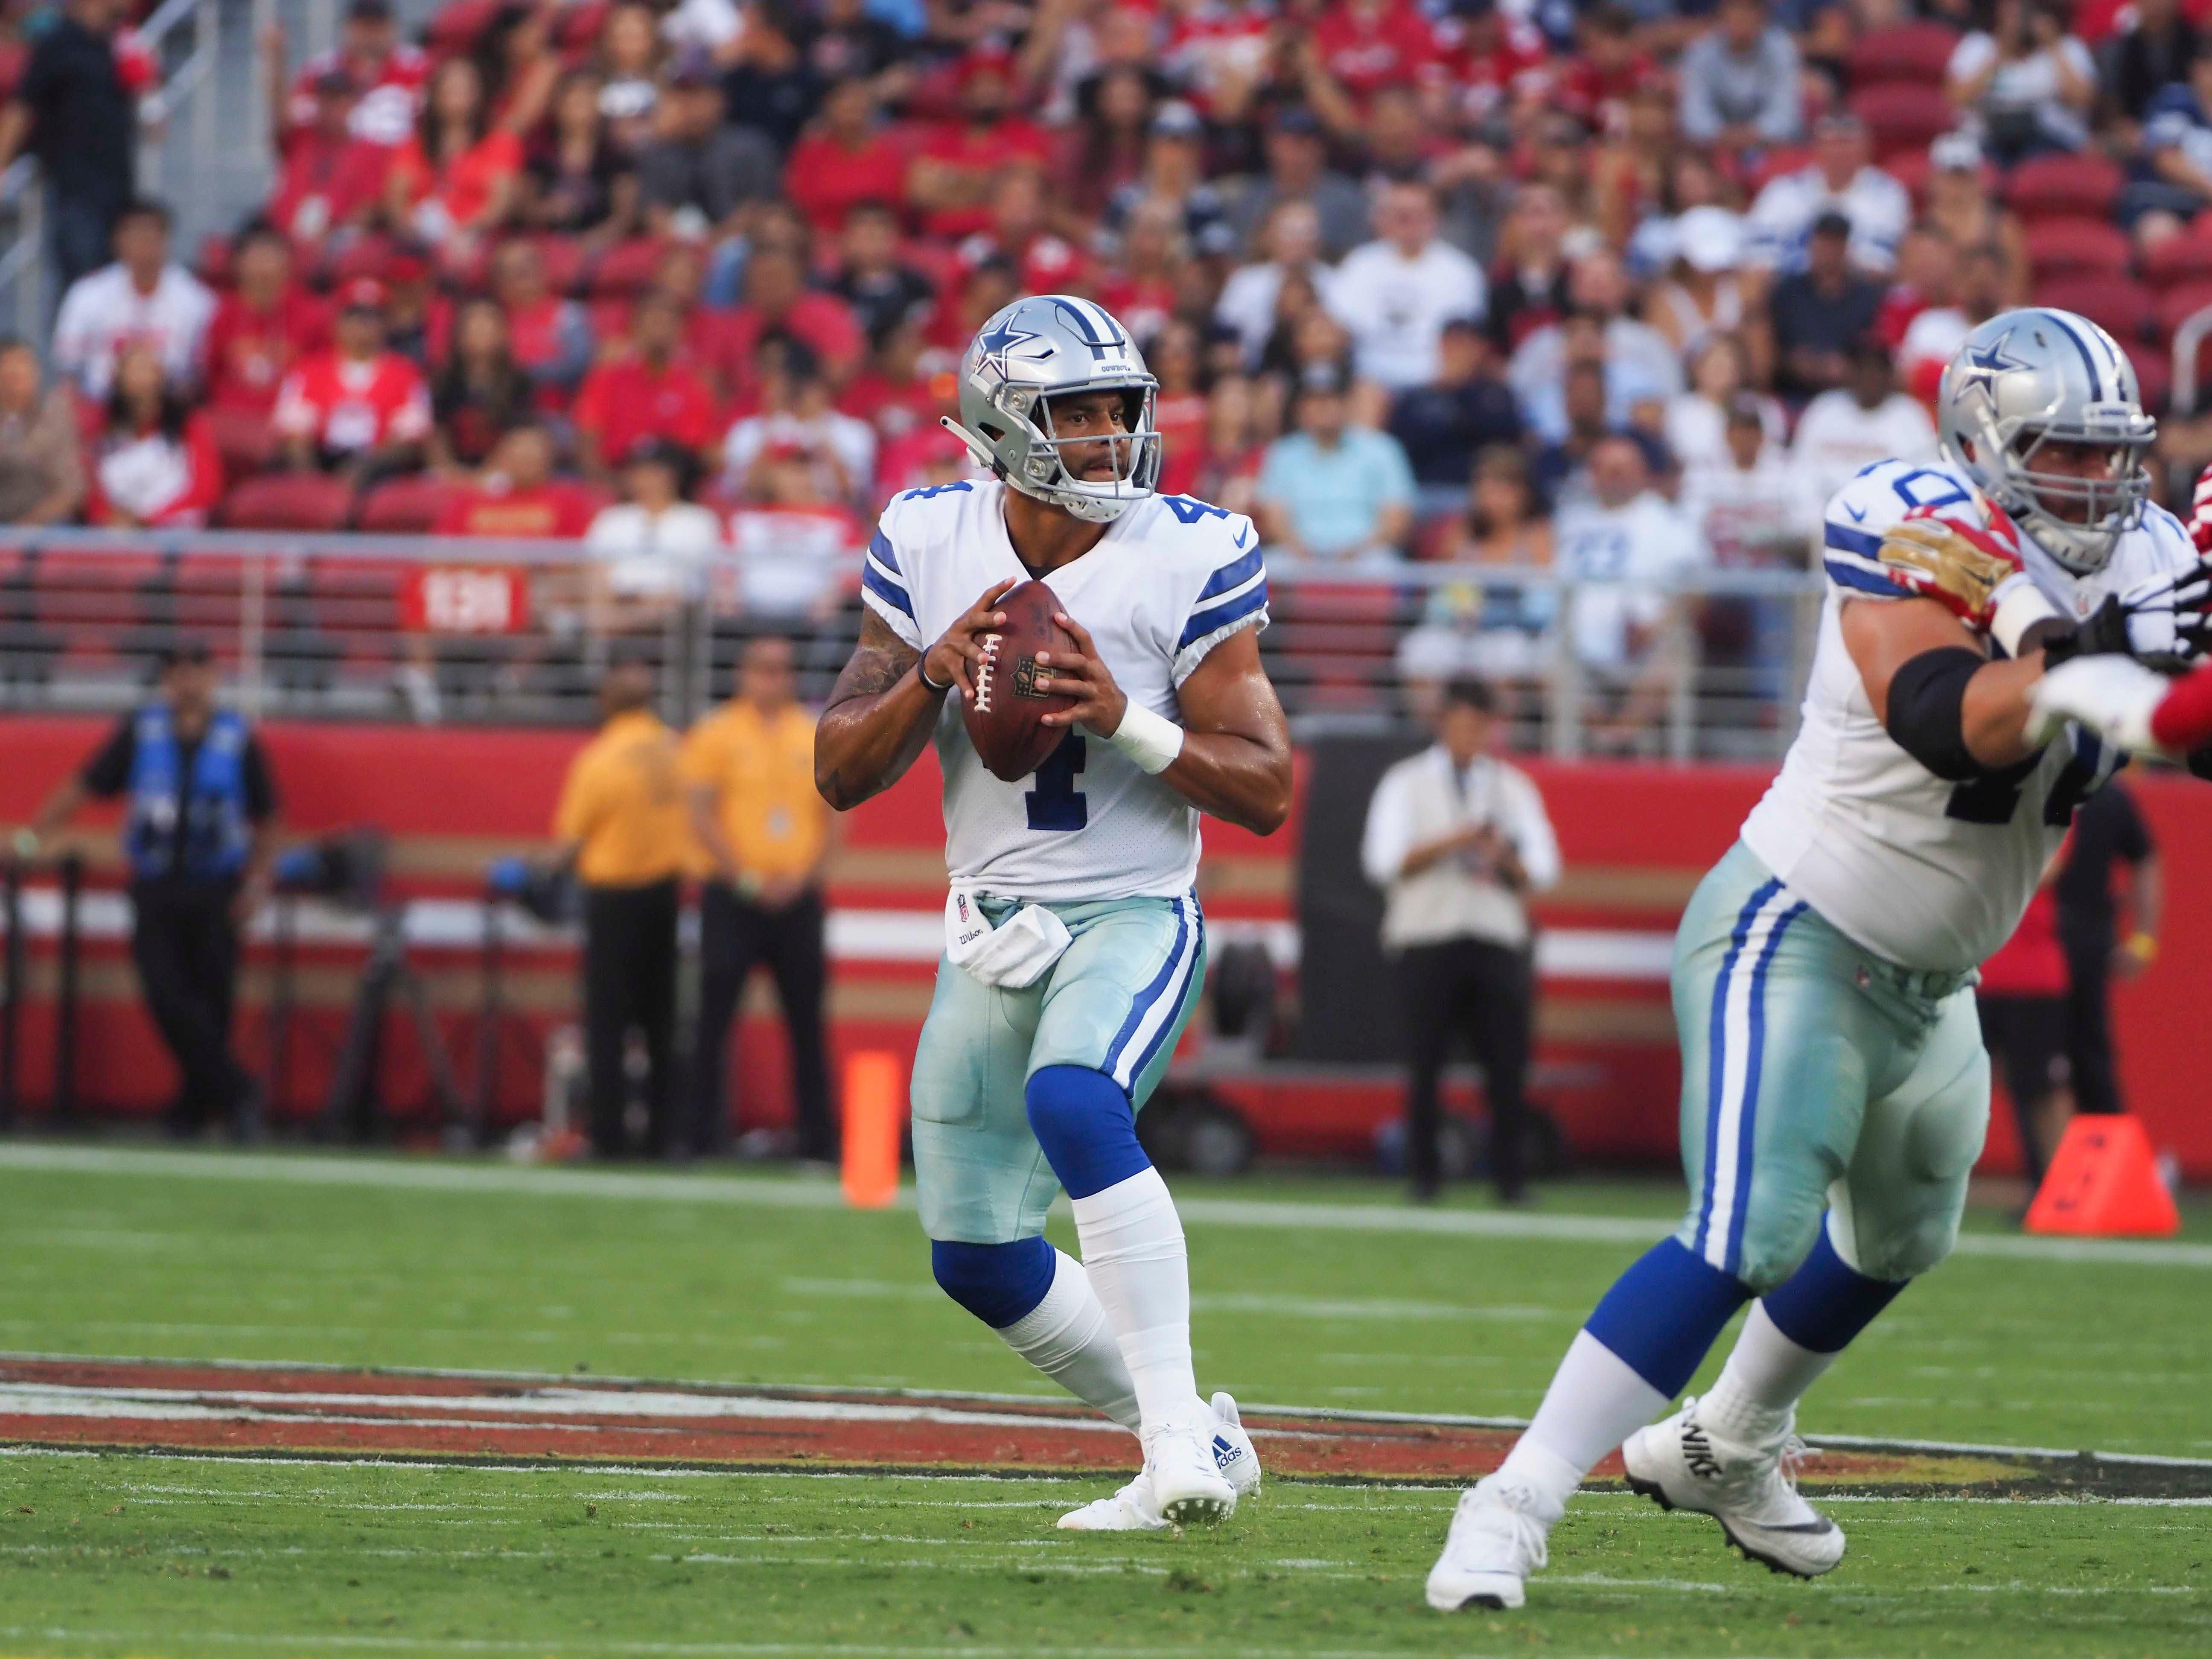 Aug 9, 2018; Santa Clara, CA, USA; Dallas Cowboys quarterback Dak Prescott (4) controls the ball against the San Francisco 49ers during the first quarter at Levi's Stadium. Mandatory Credit: Kelley L Cox-USA TODAY Sports